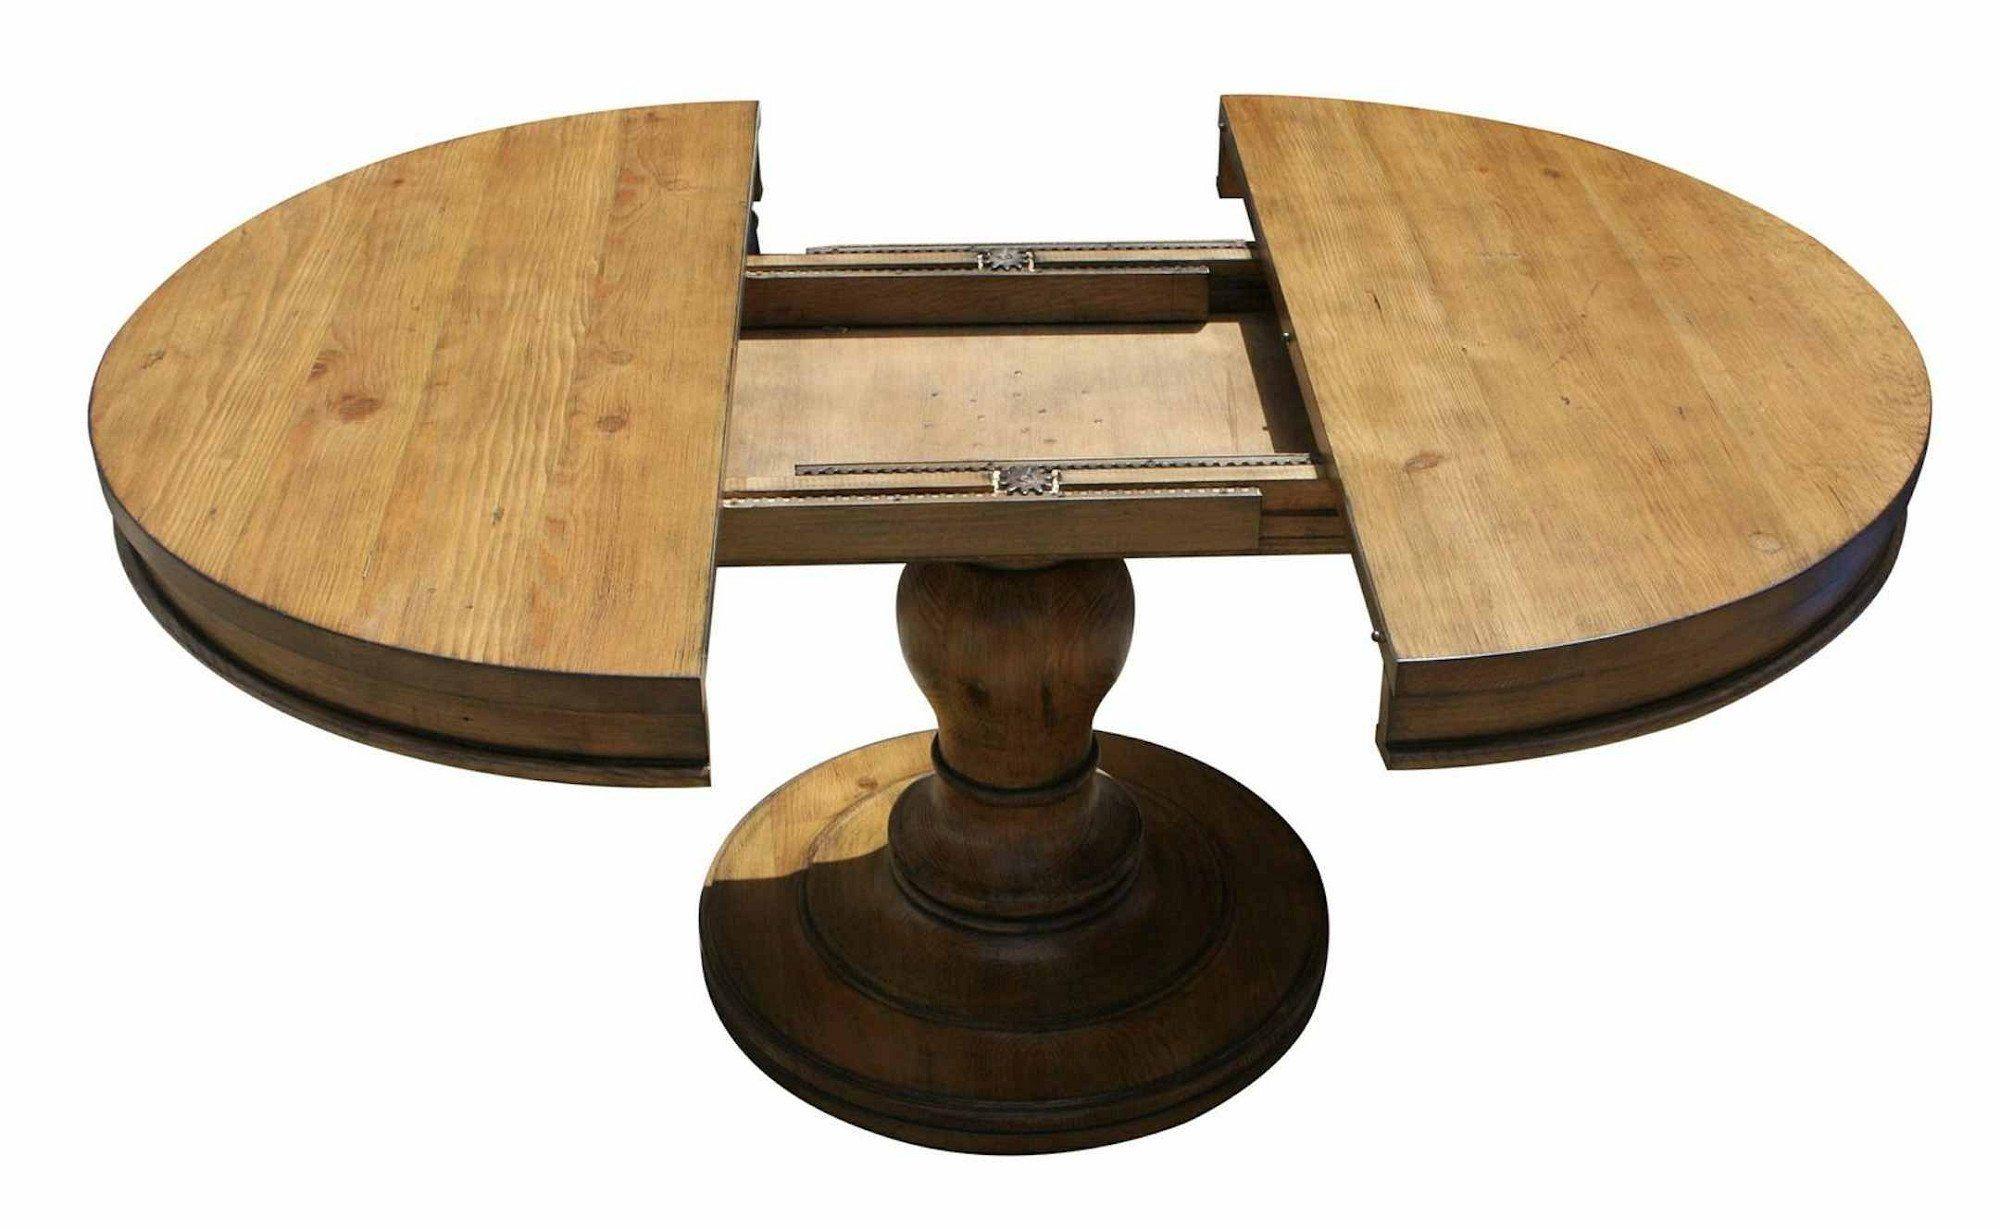 Westport Round Reclaimed Wood Extension Pedestal Table Round